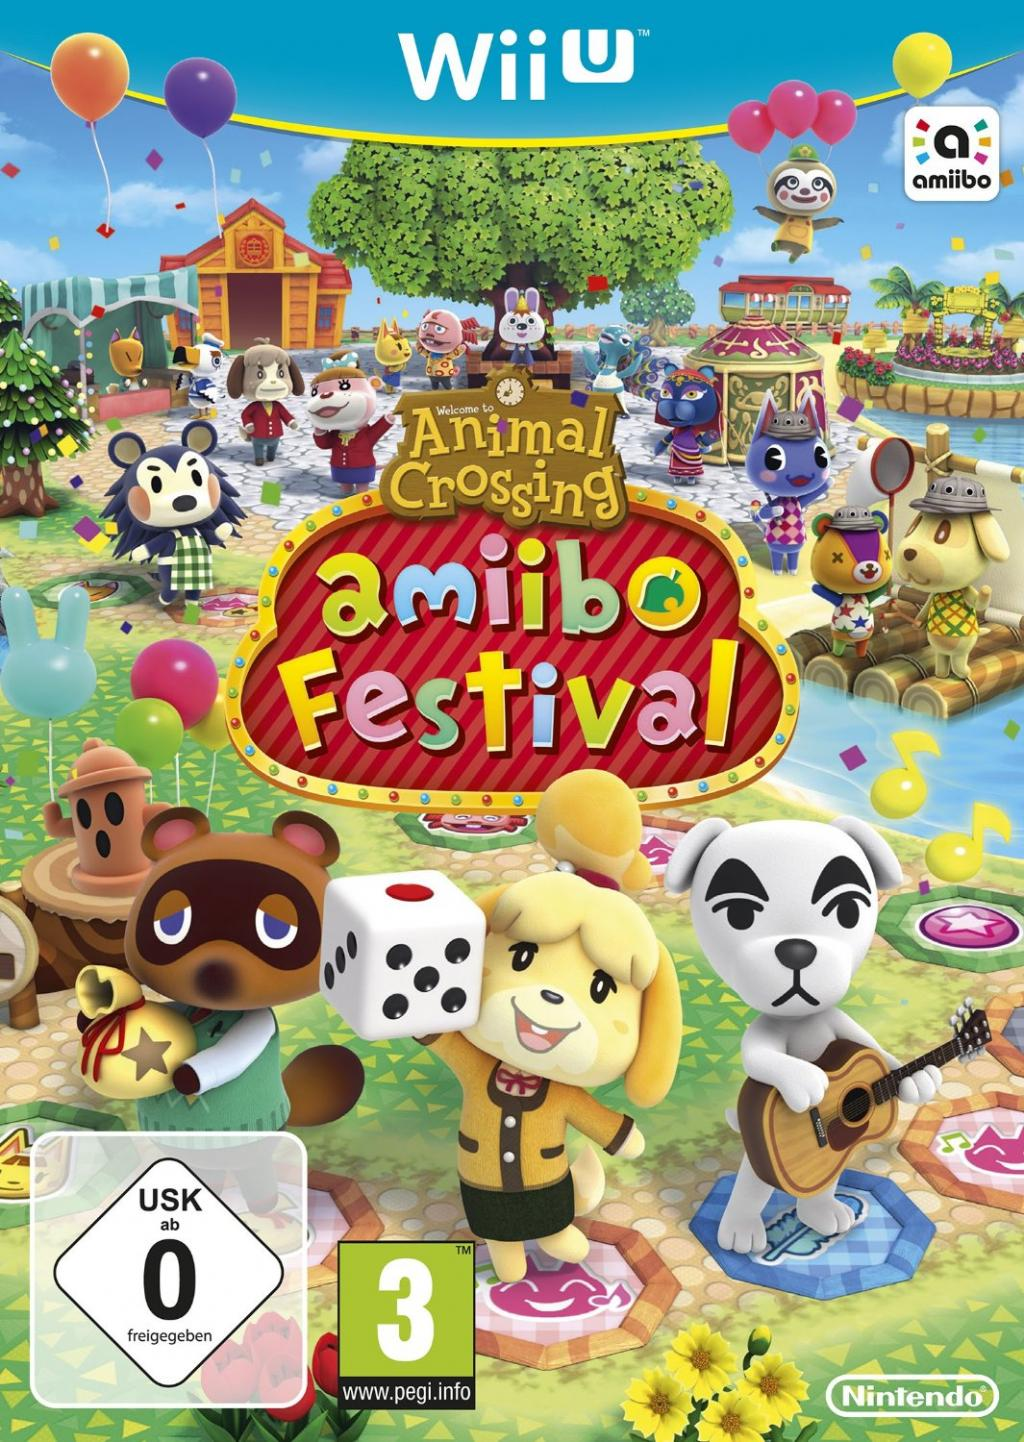 ANIMAL CROSSING AMIIBO FESTIVAL + 2 AMIIBO + 3 CARDS_2